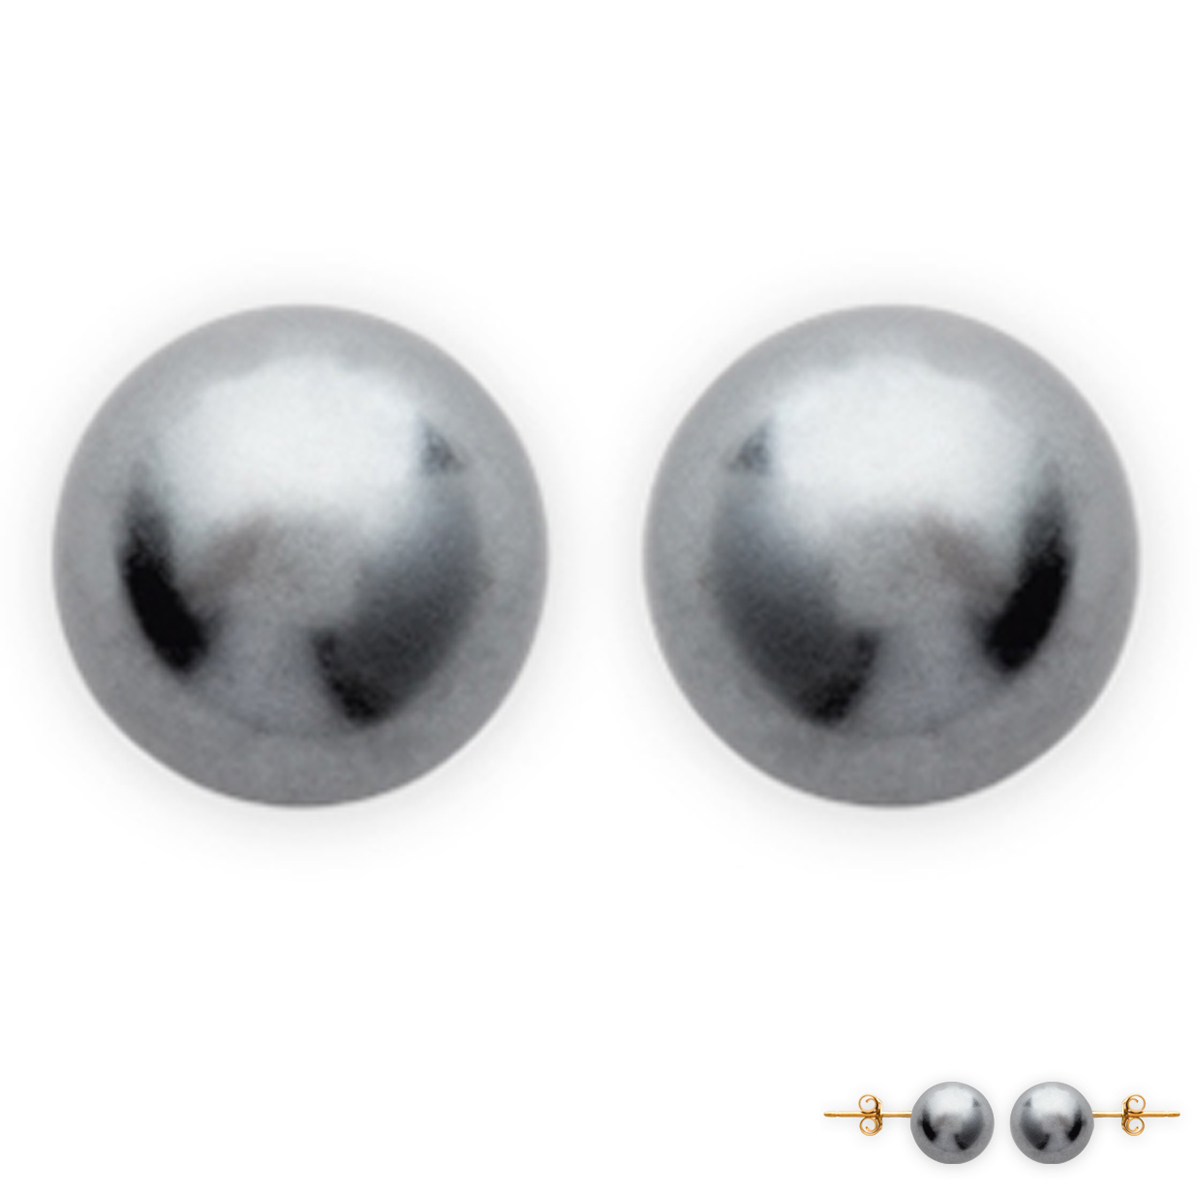 BO Plaqué Or Perles Grises 10 mm - [B8468]